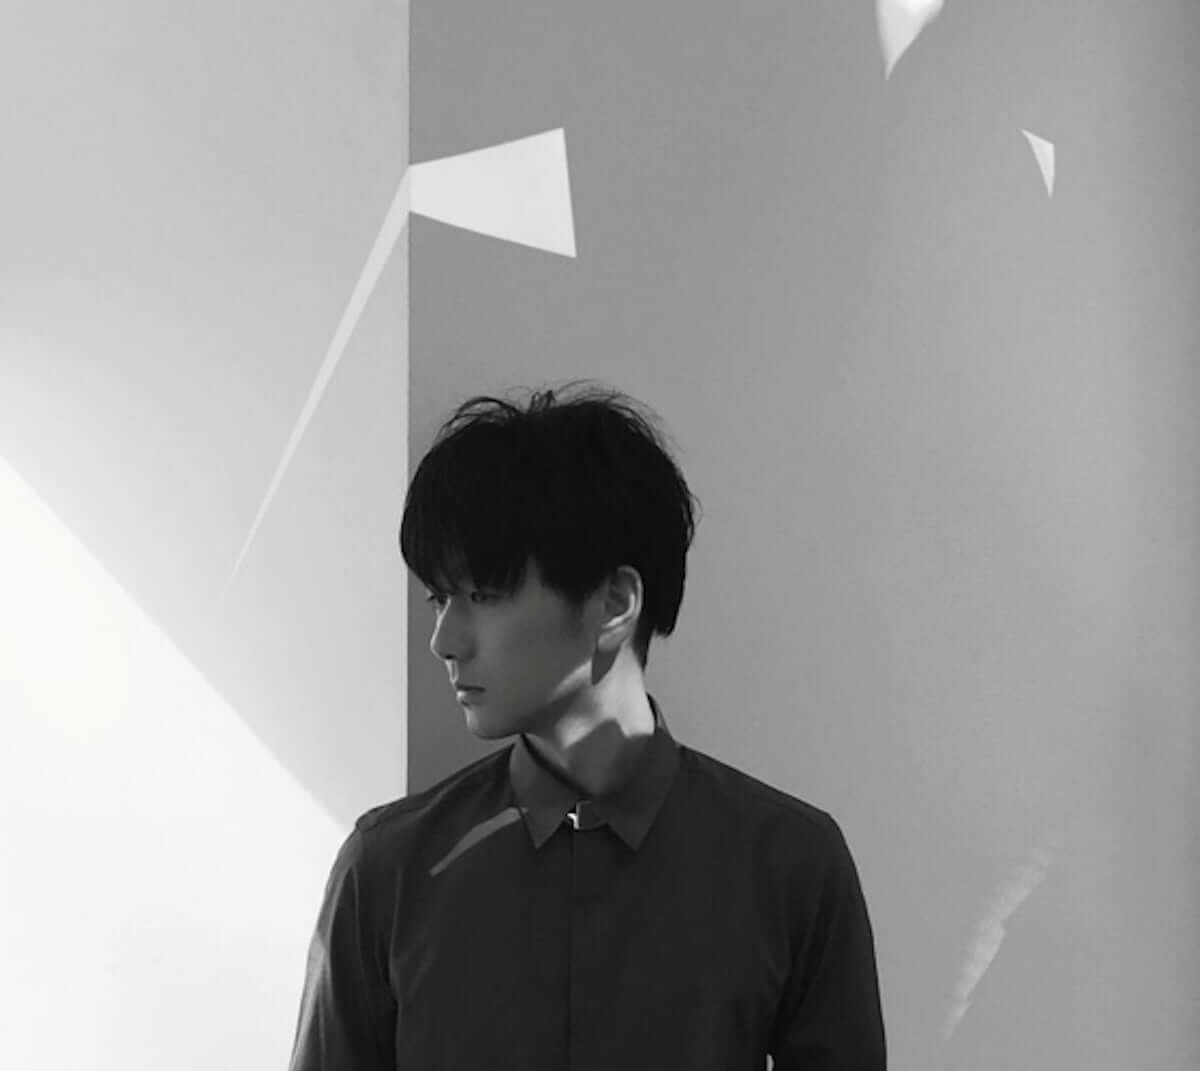 OUTATBERO自主企画<H.R.A.R>にimai、世武裕子、agraphが登場|4月24日新宿MARZ、5月11日京都METROにて music190315_outatbero_4-1200x1071